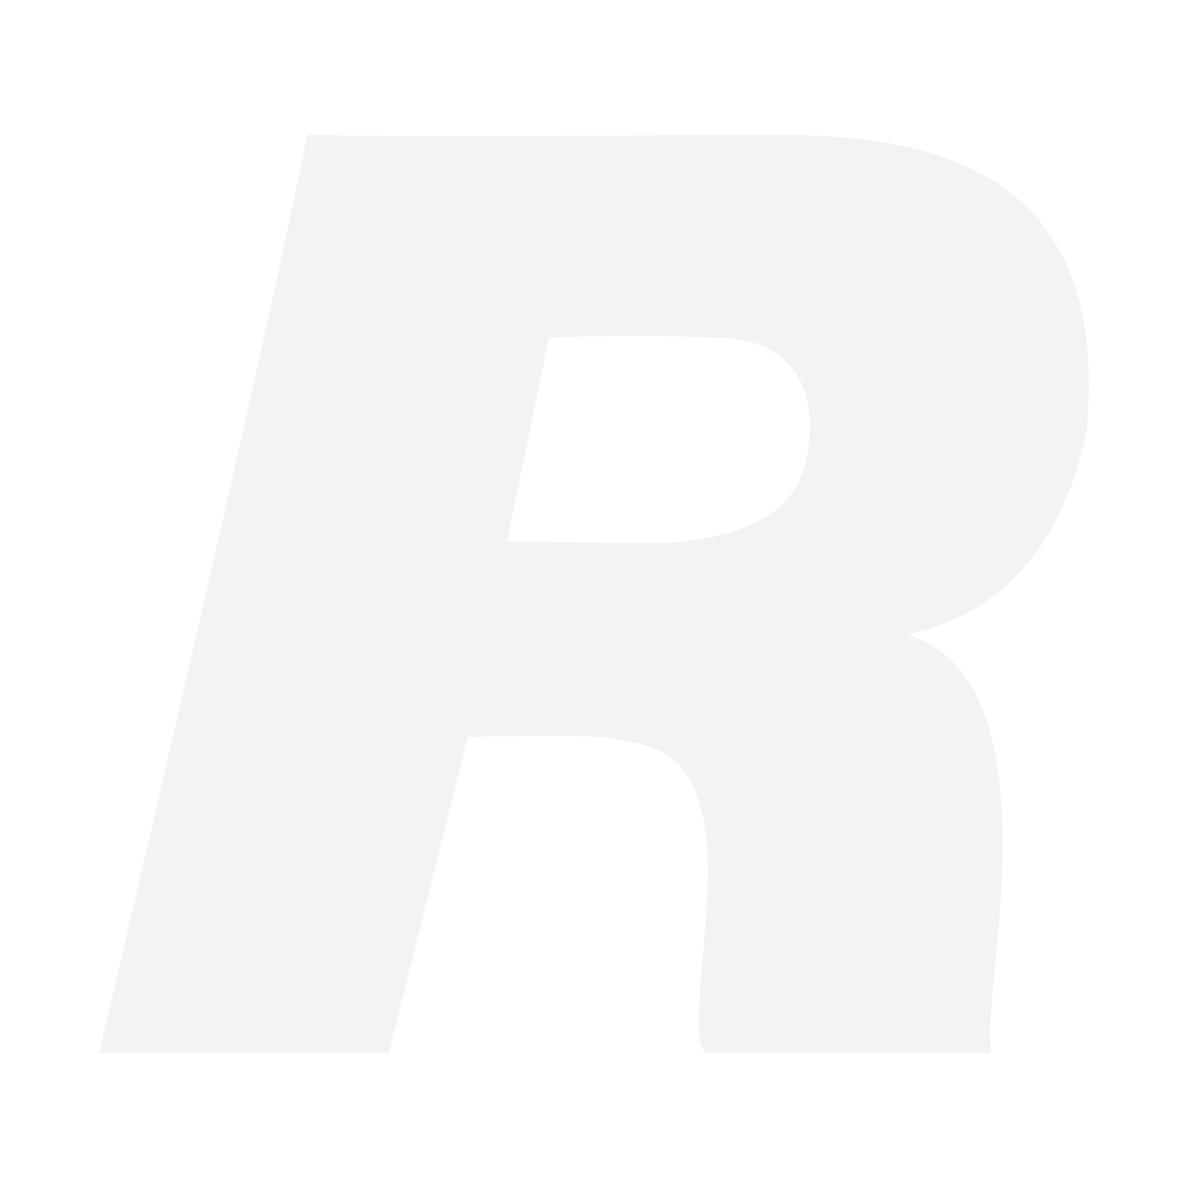 MICNOVA MQ-TMR1 TRIPOD MOUNT RING